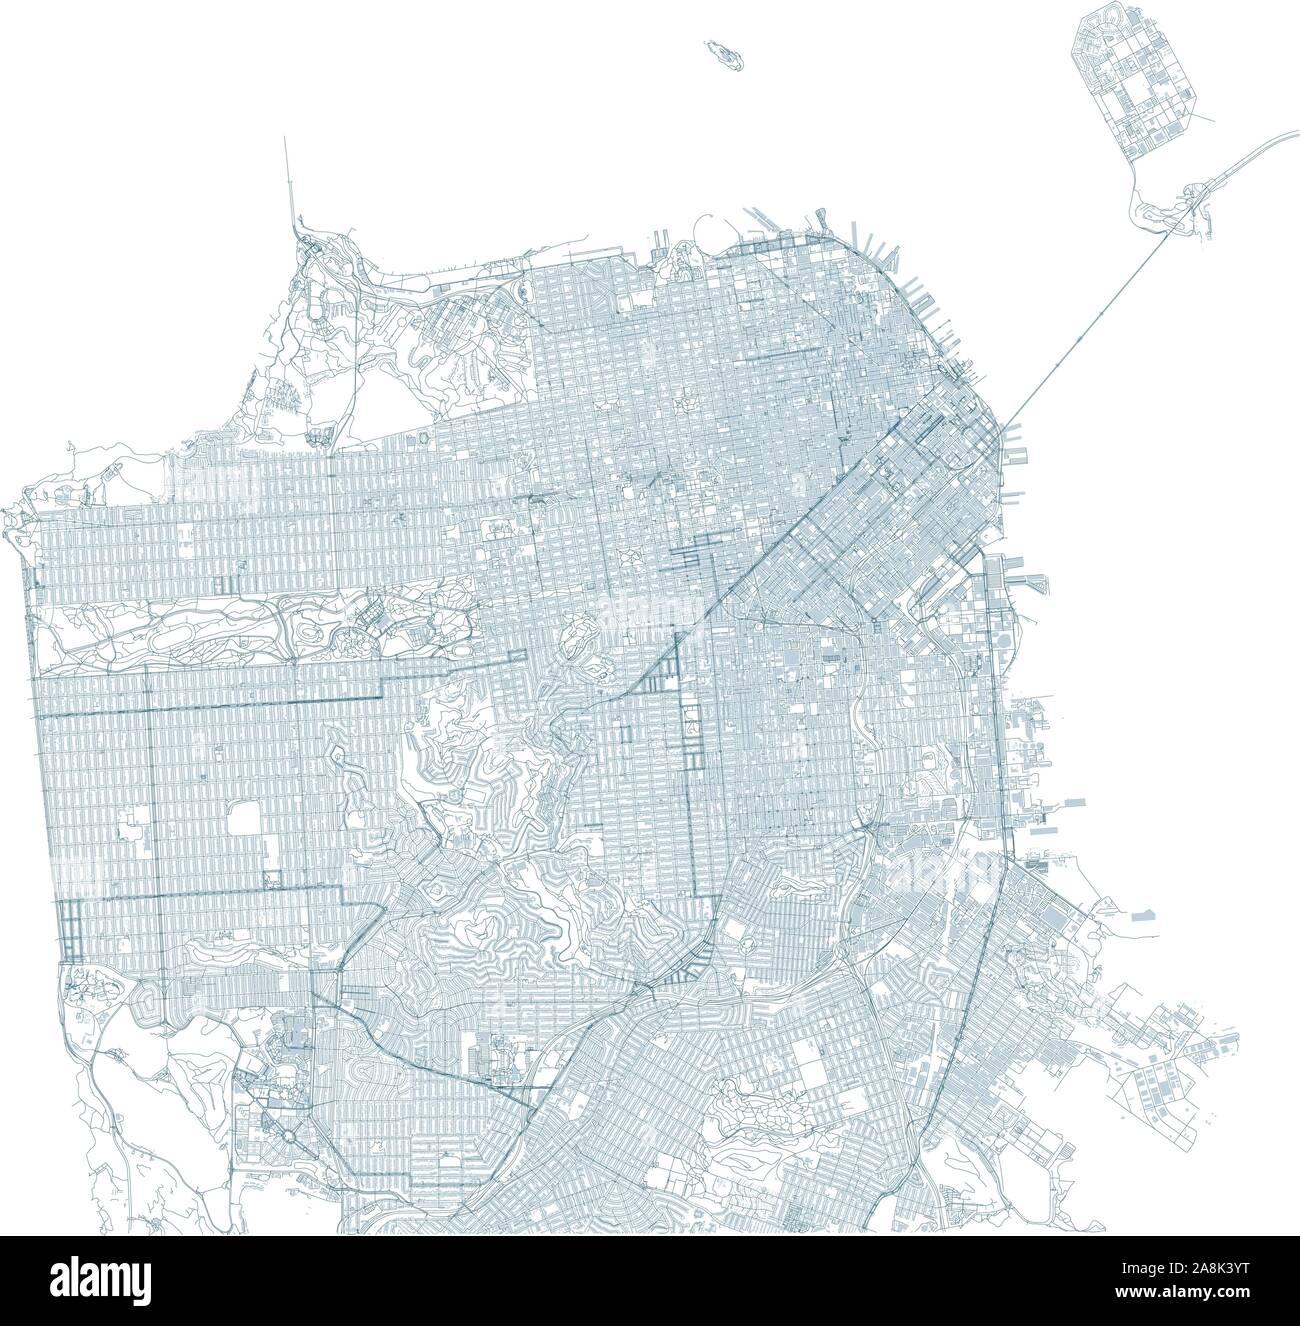 Satellite map of San Francisco and buildings, California ... on usa network, usa television, usa map night, usa fishing, usa technologies, usa car, usa satellite light, usa 193 spy satellite, usa satellite night,